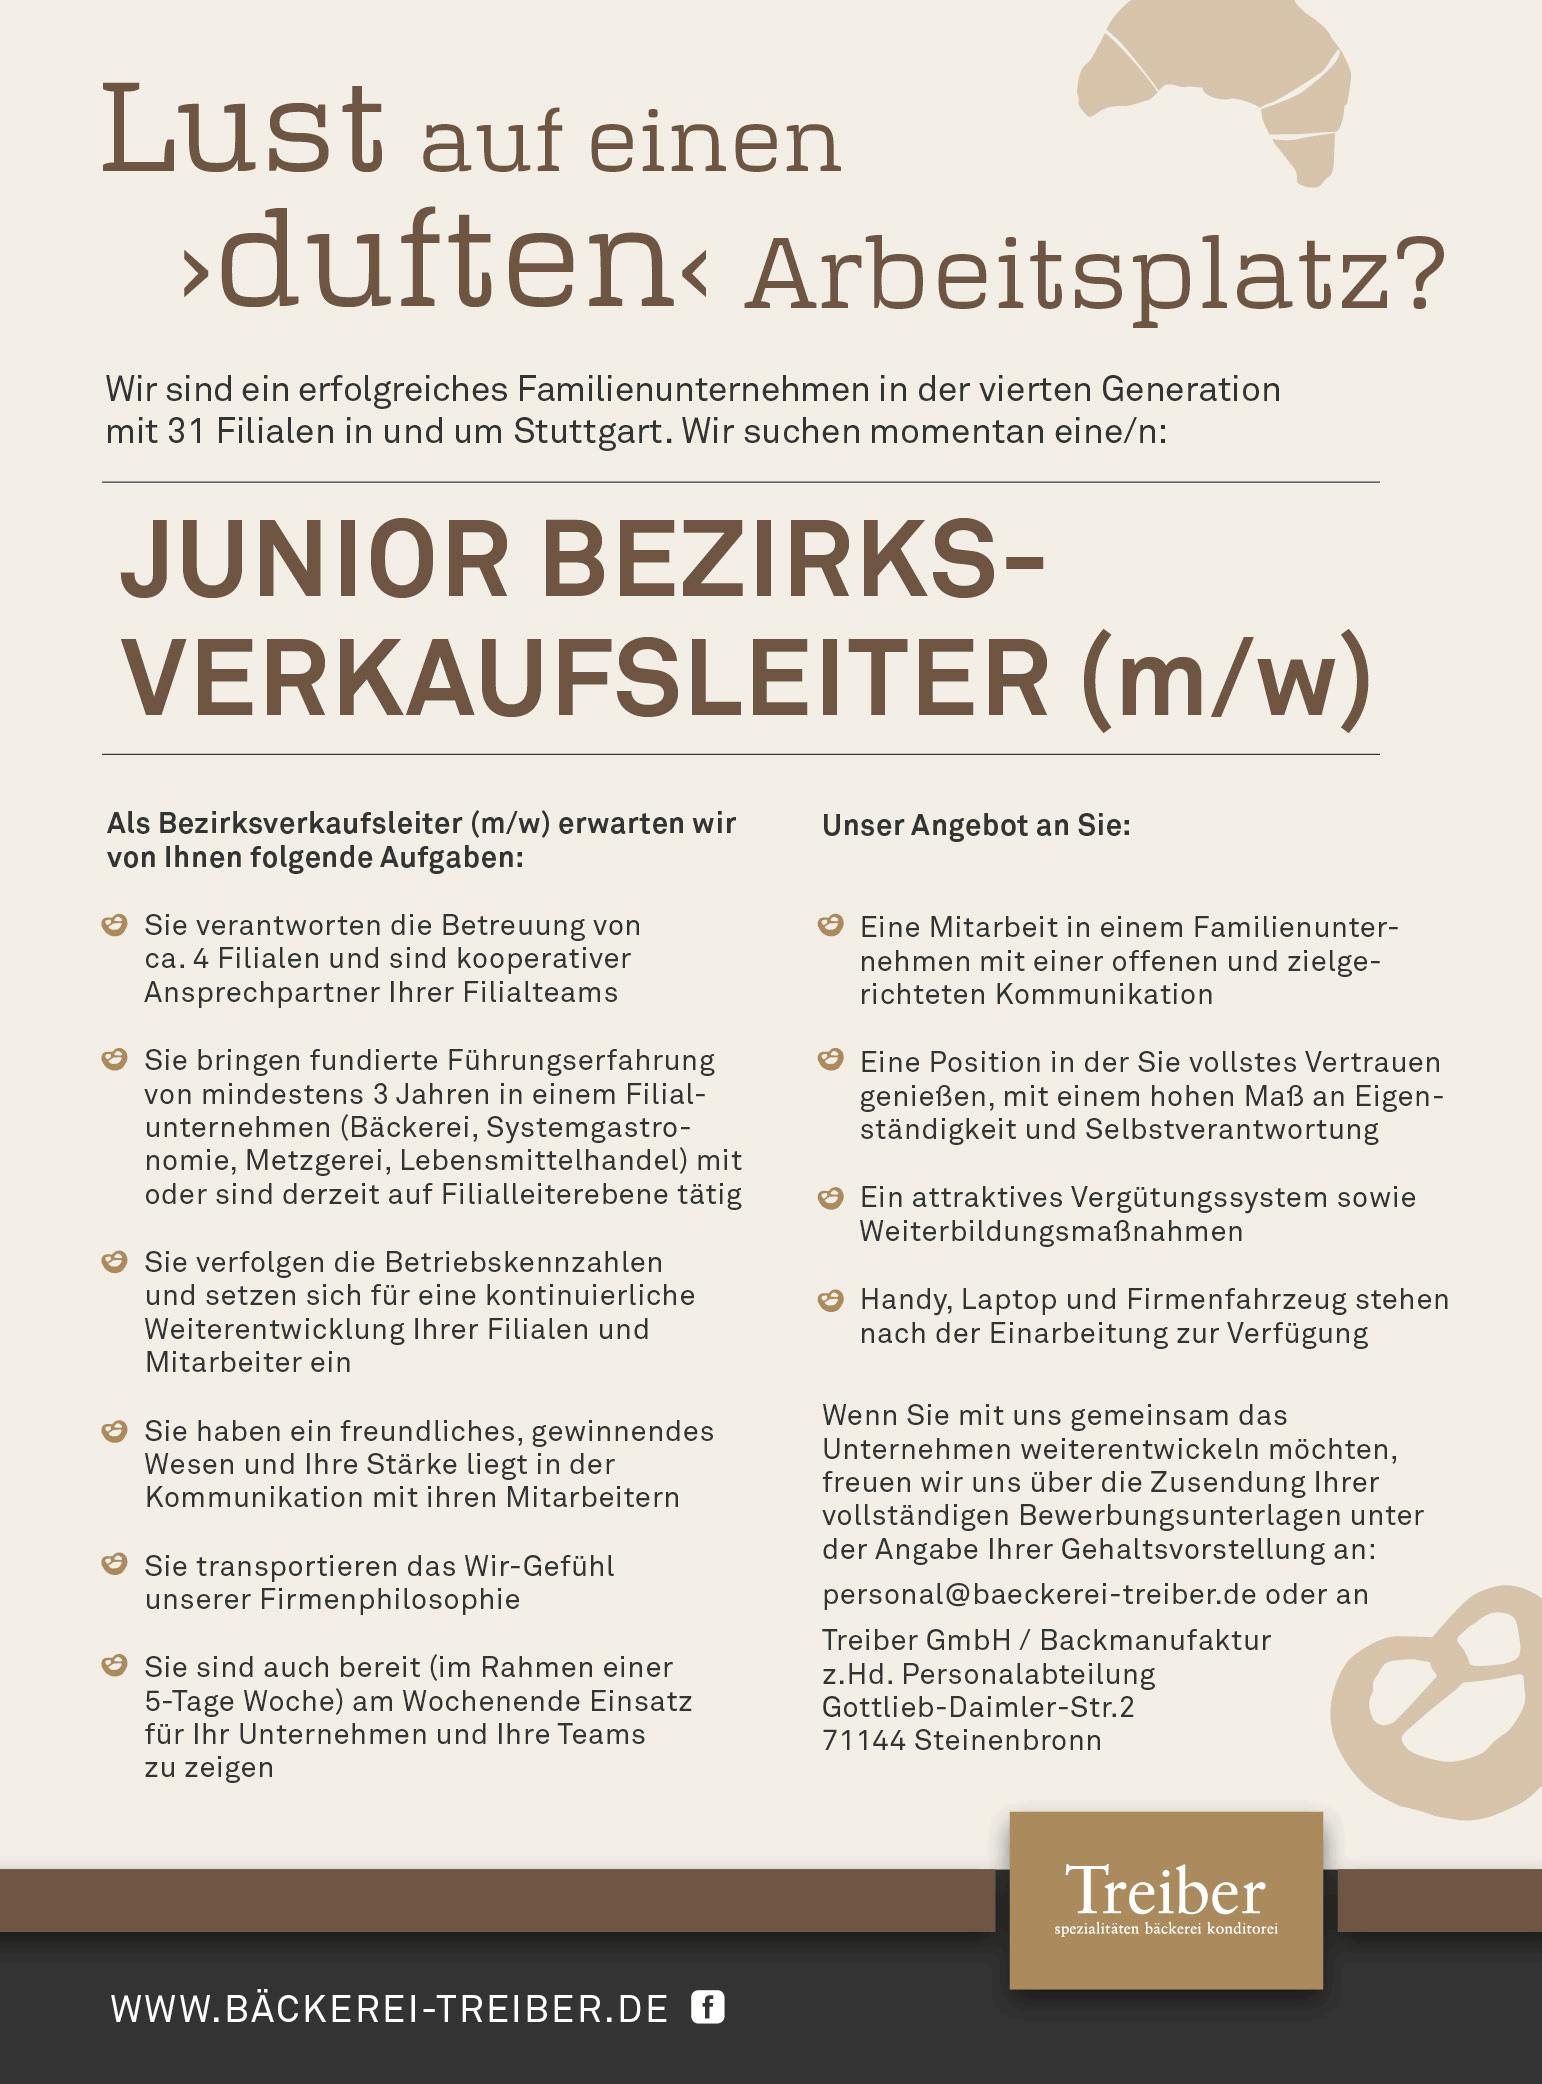 junior bezirksverkaufsleiter mw - Bewerbung Backerei Aushilfe